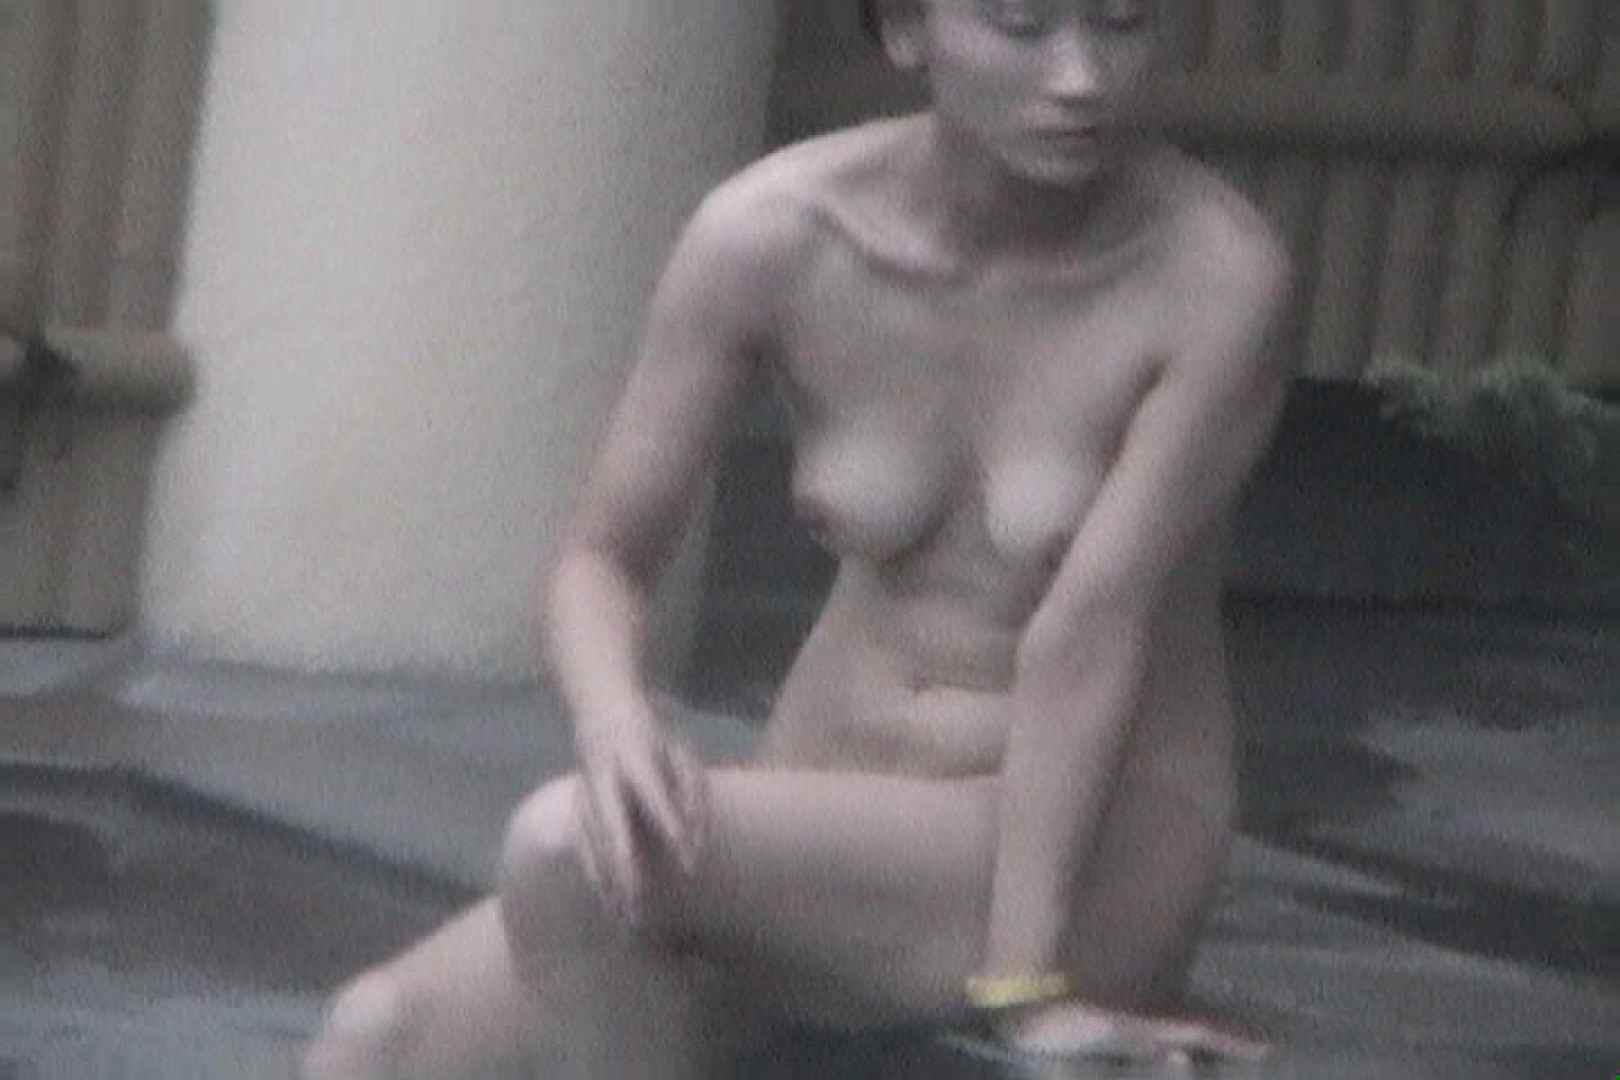 Aquaな露天風呂Vol.557 露天 | OL女体  40連発 22